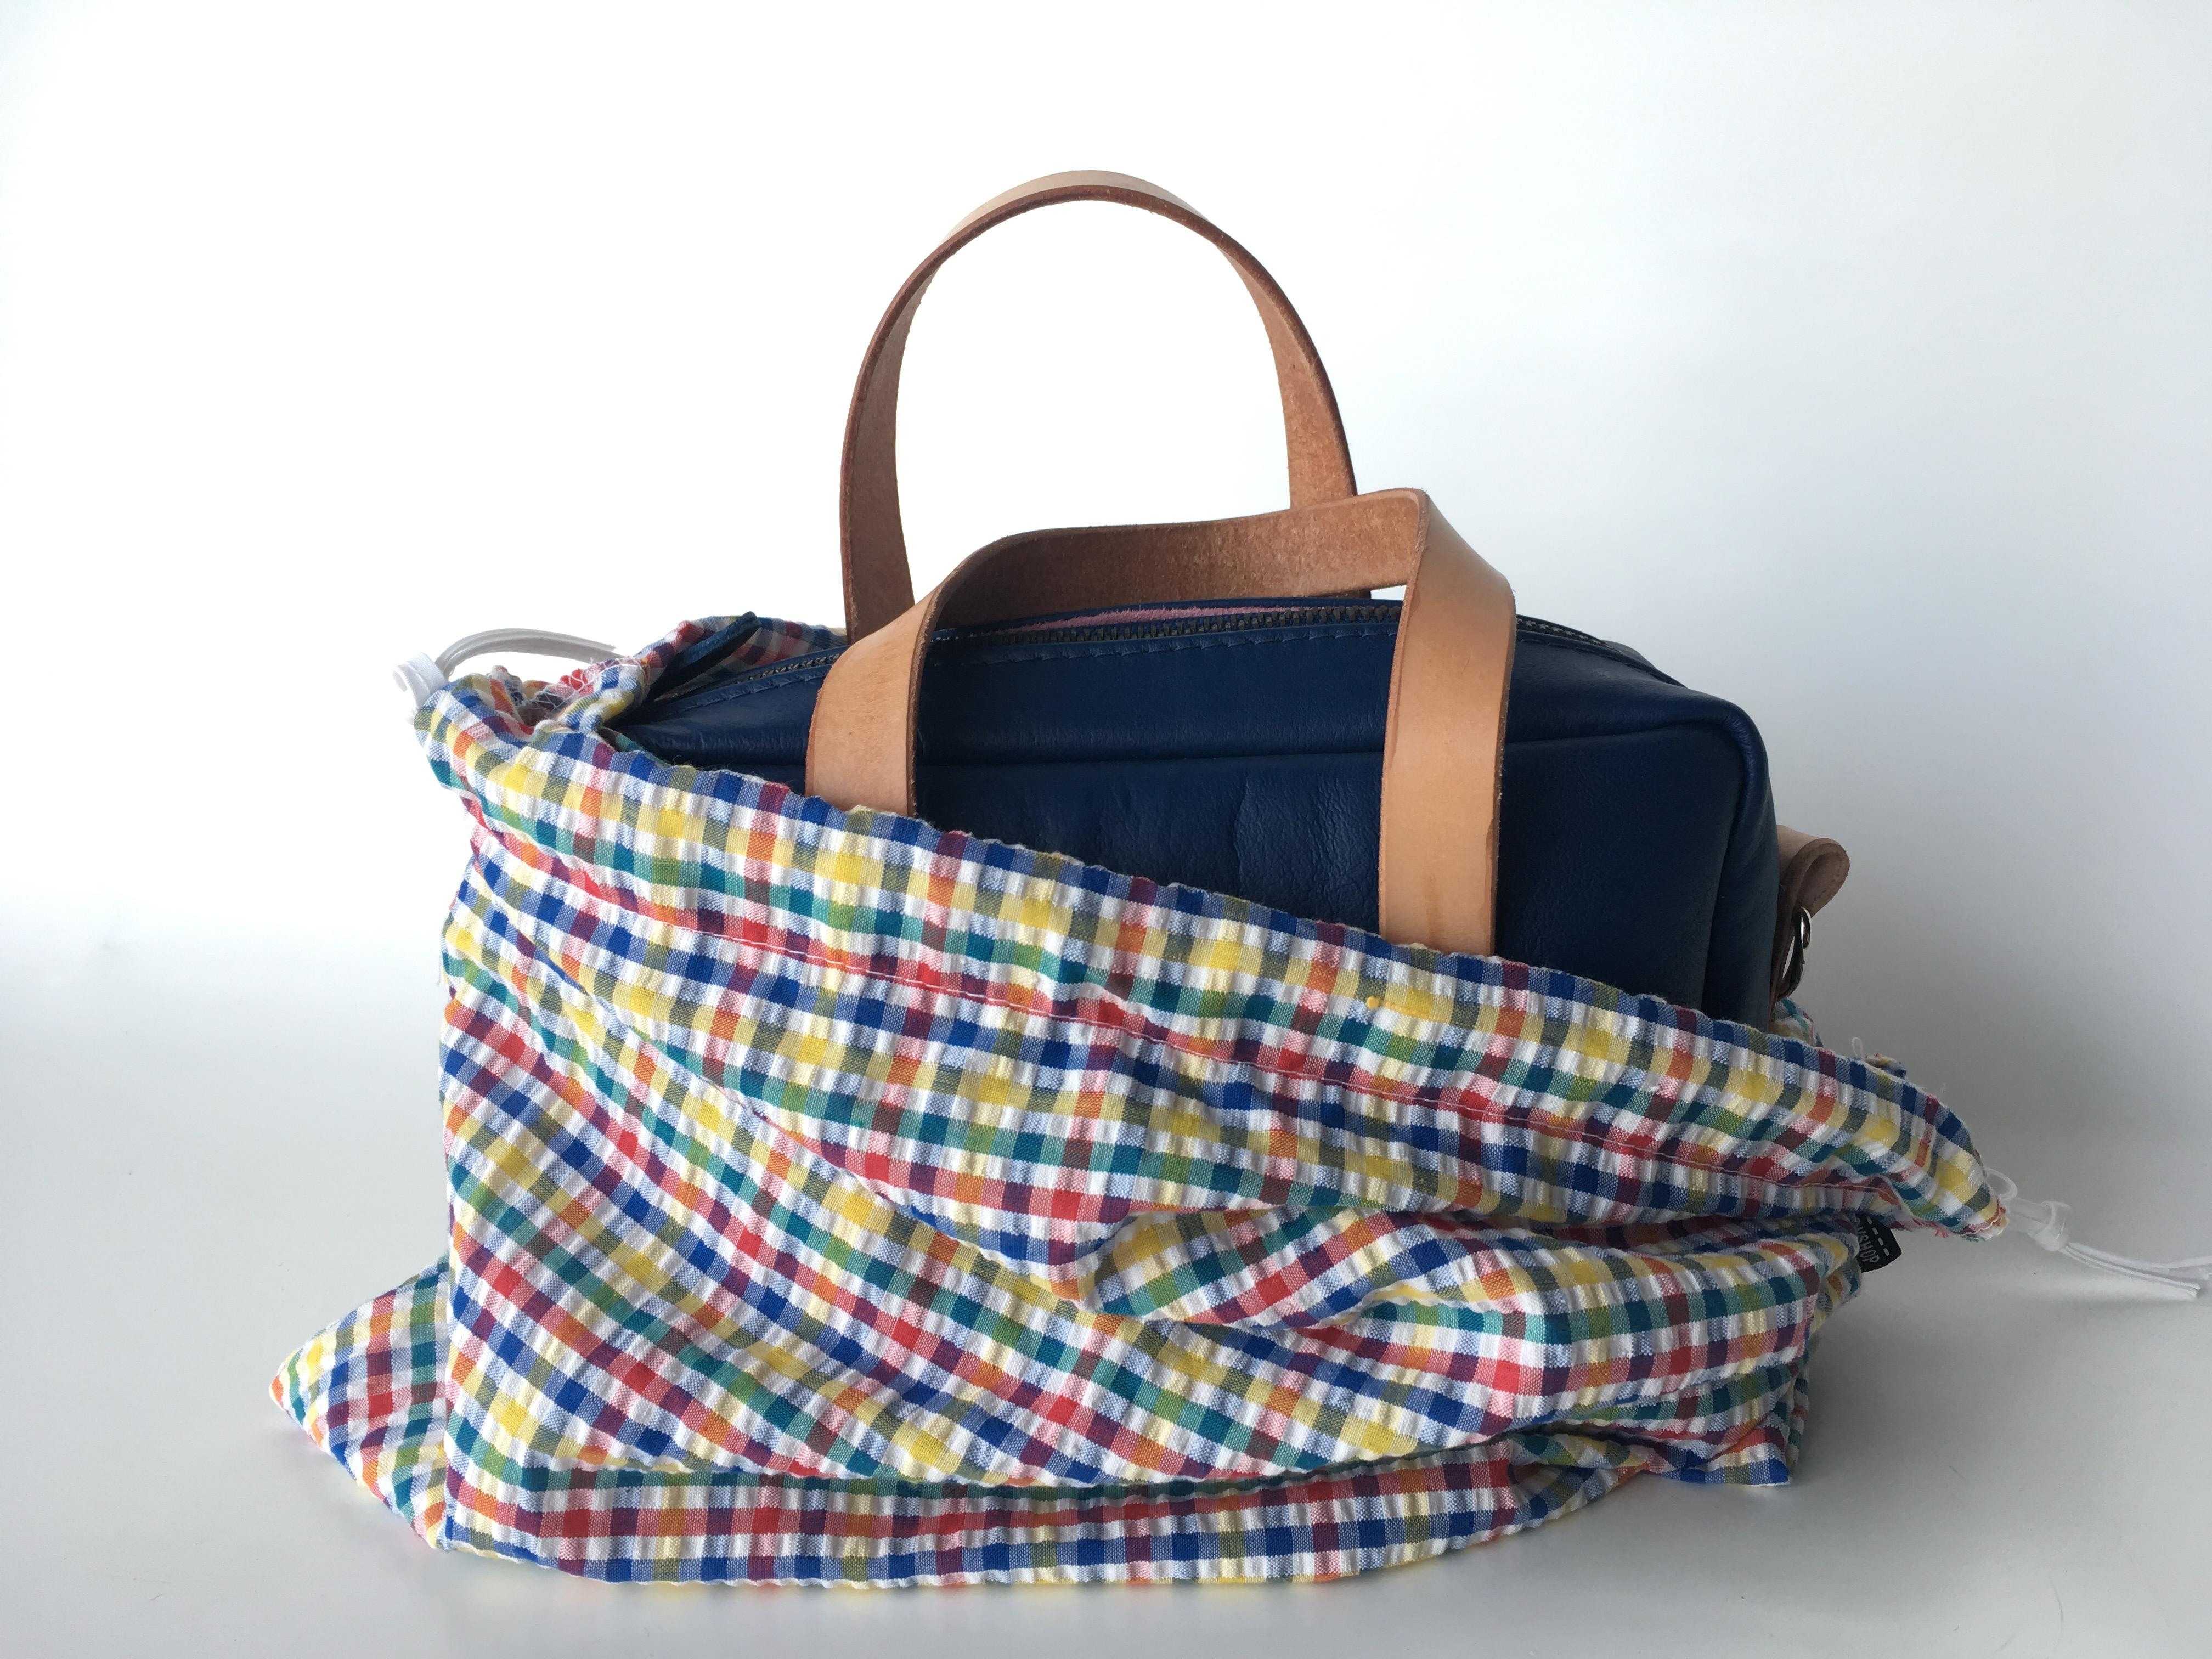 Blue Leather Mini Duffel bag in protective gingham drawstring bag